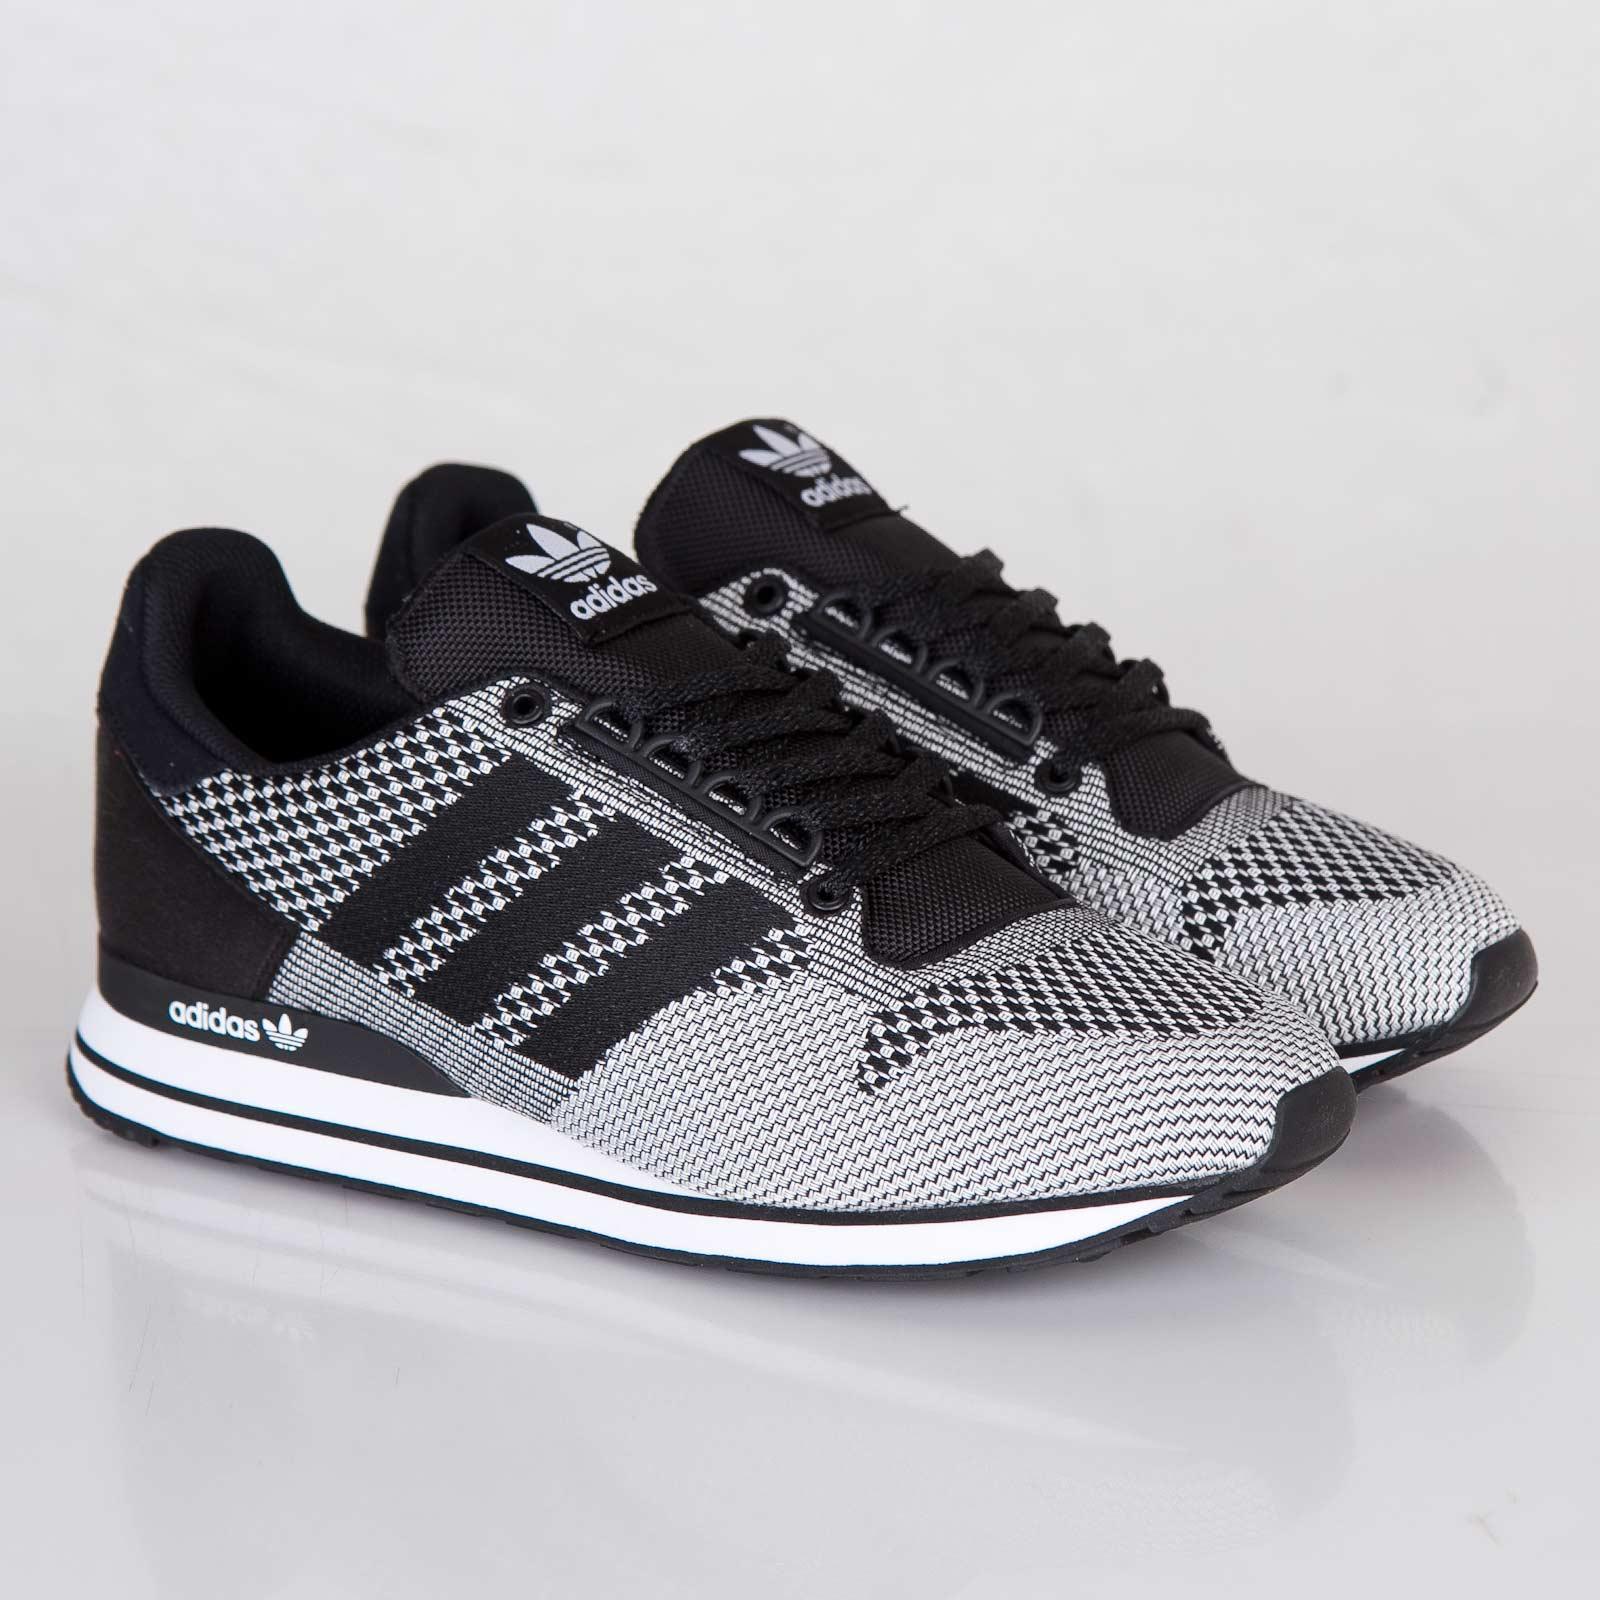 2982870e9 adidas ZX 500 OG Weave - M20993 - Sneakersnstuff